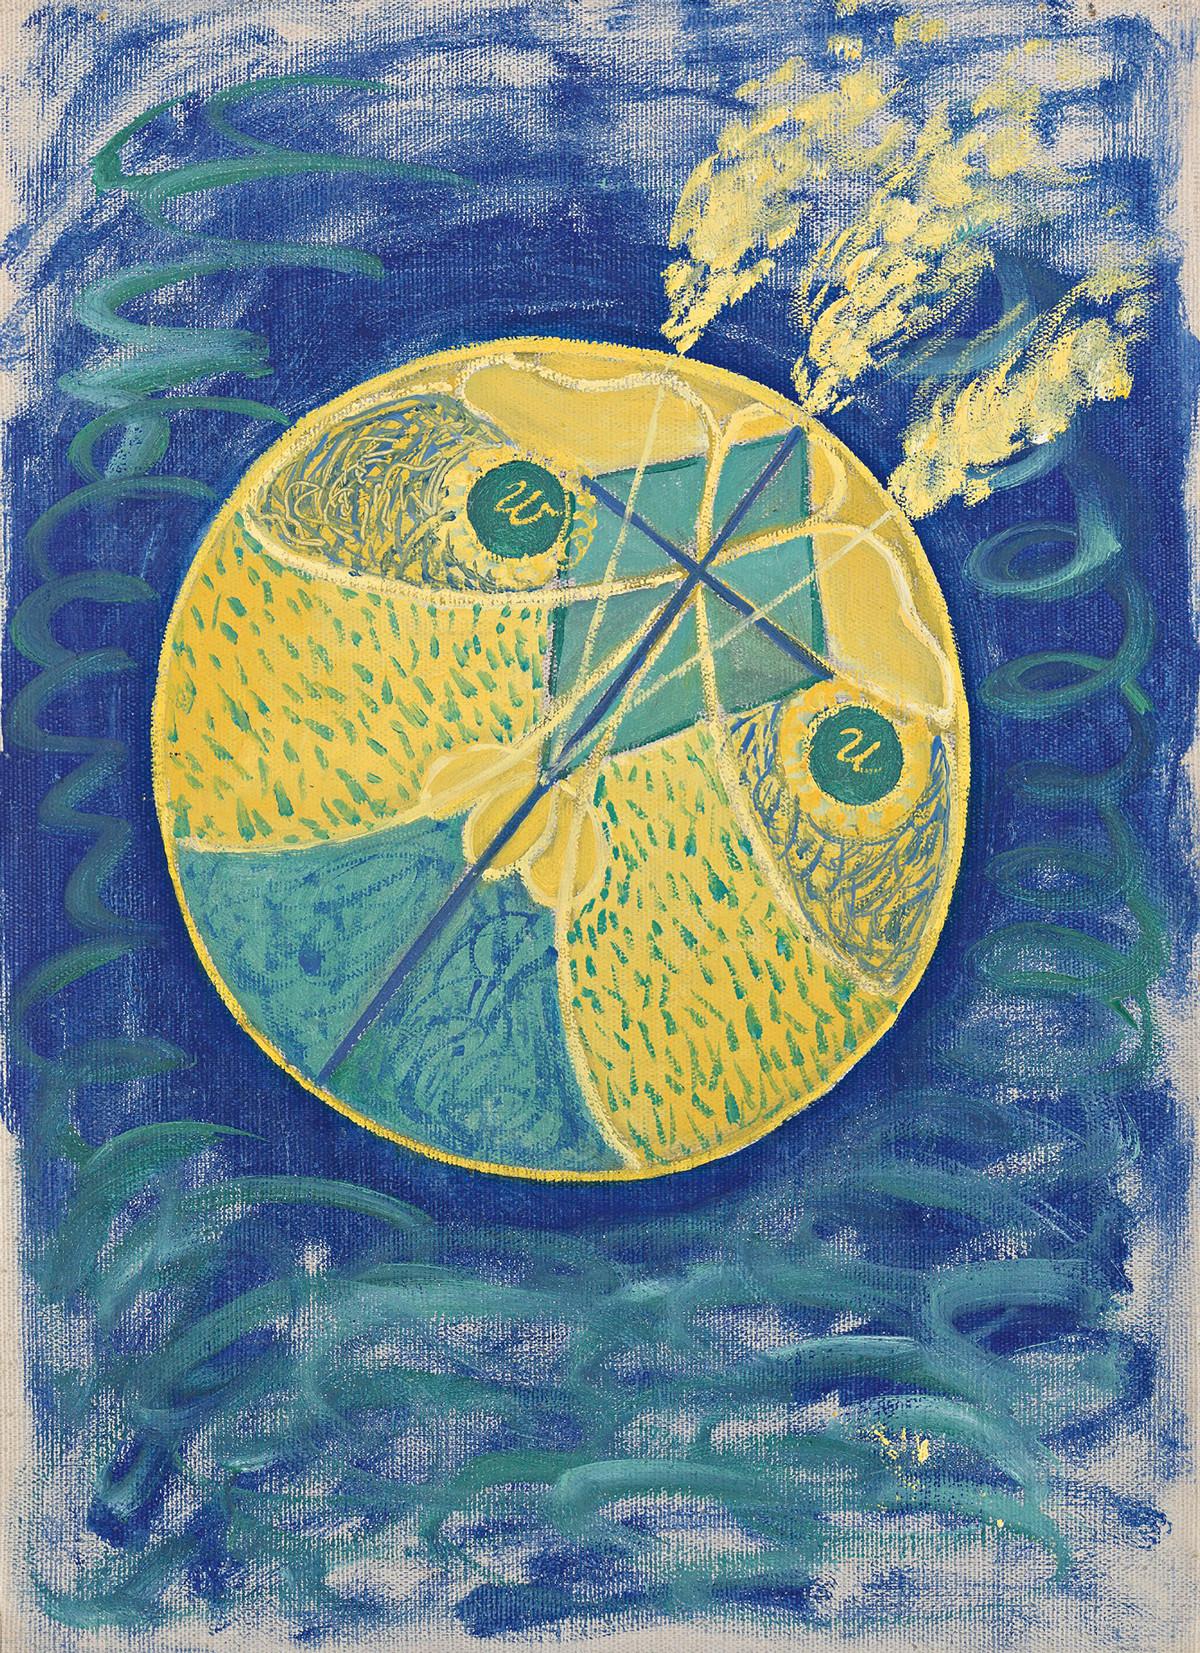 hilma-af-klint-group-i-no-7-primordial-chaos-1907-trivium-art-history[1]